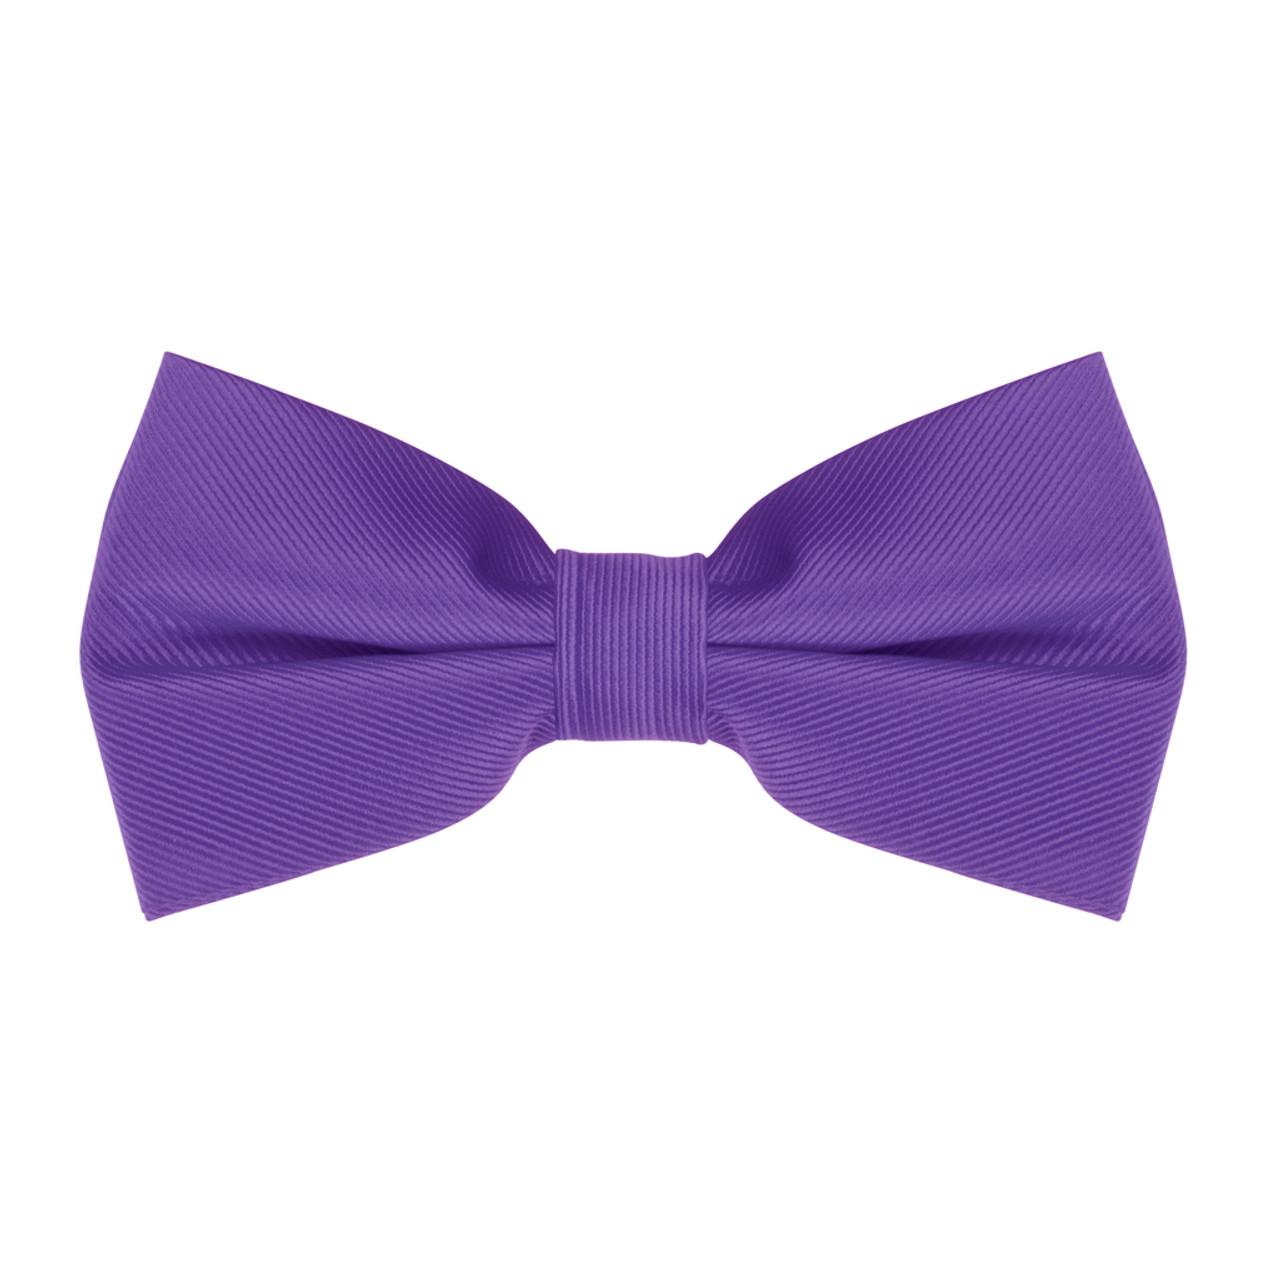 Pre-tied Bow tie Lavender Flowers Bow tie /& Suspenders XL Black Suspenders